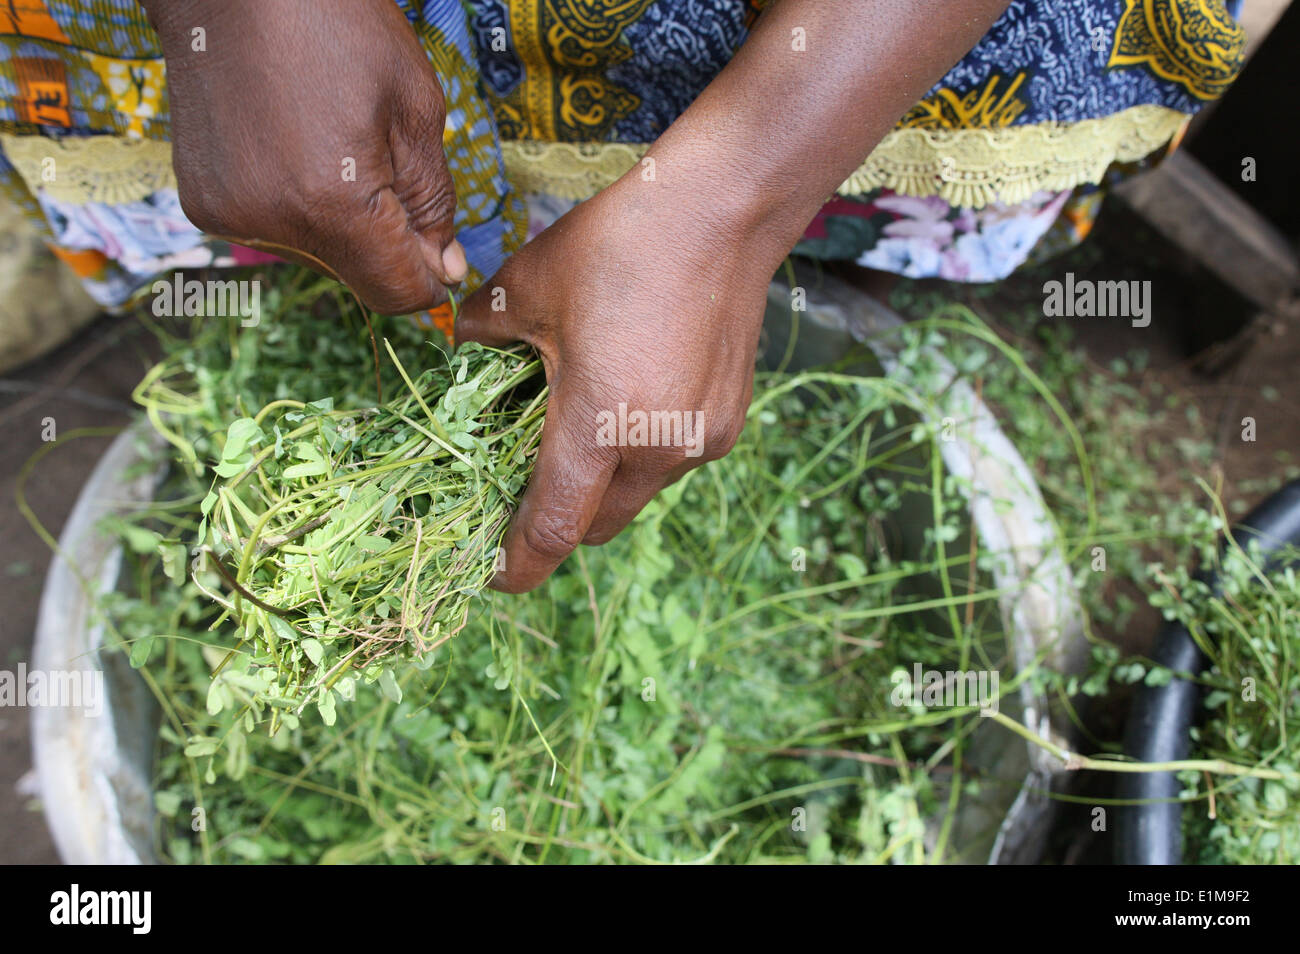 Herbal medicine - Stock Image